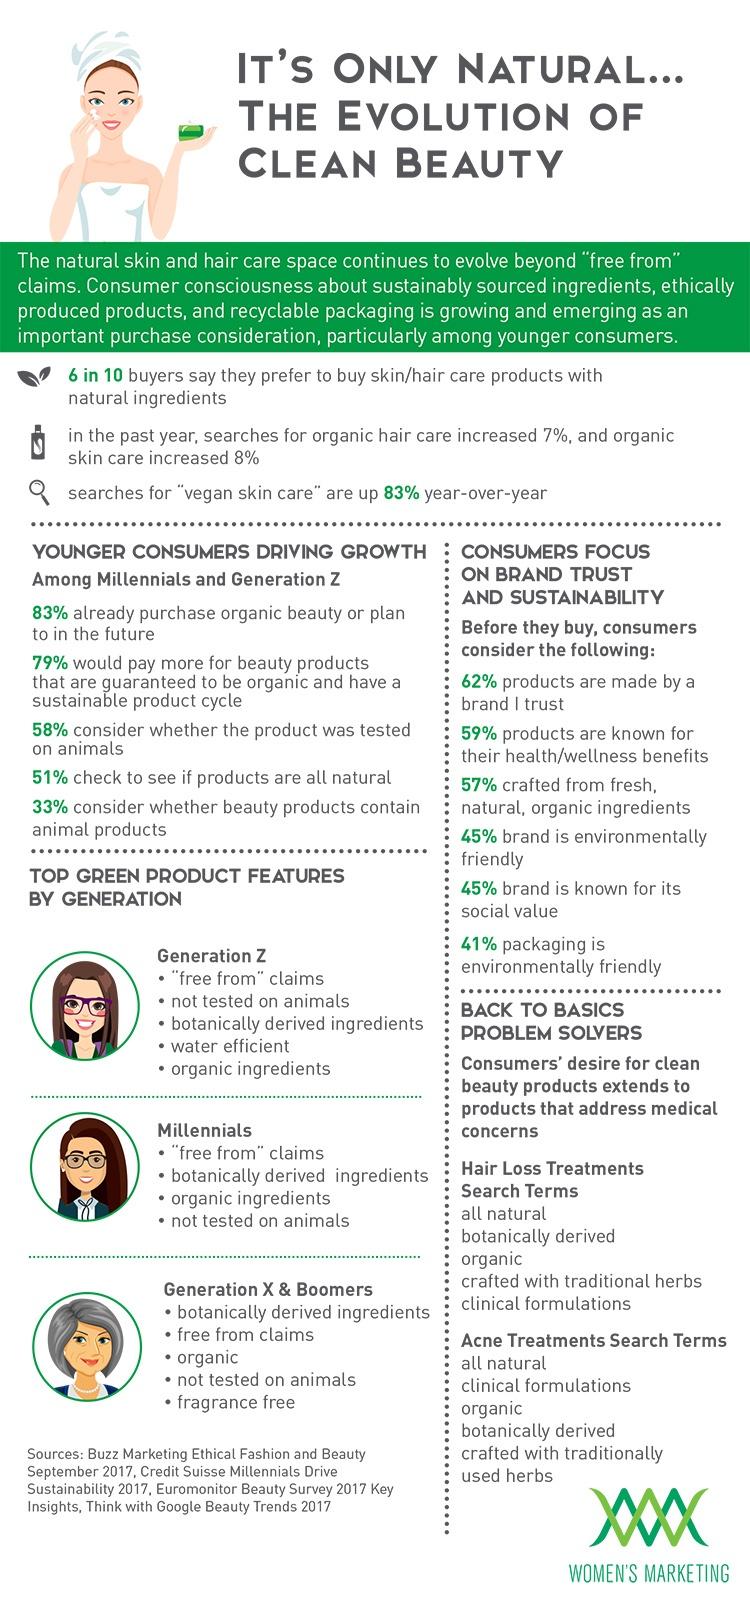 EvolutionofCleanBeauty_Infographic-1.jpg